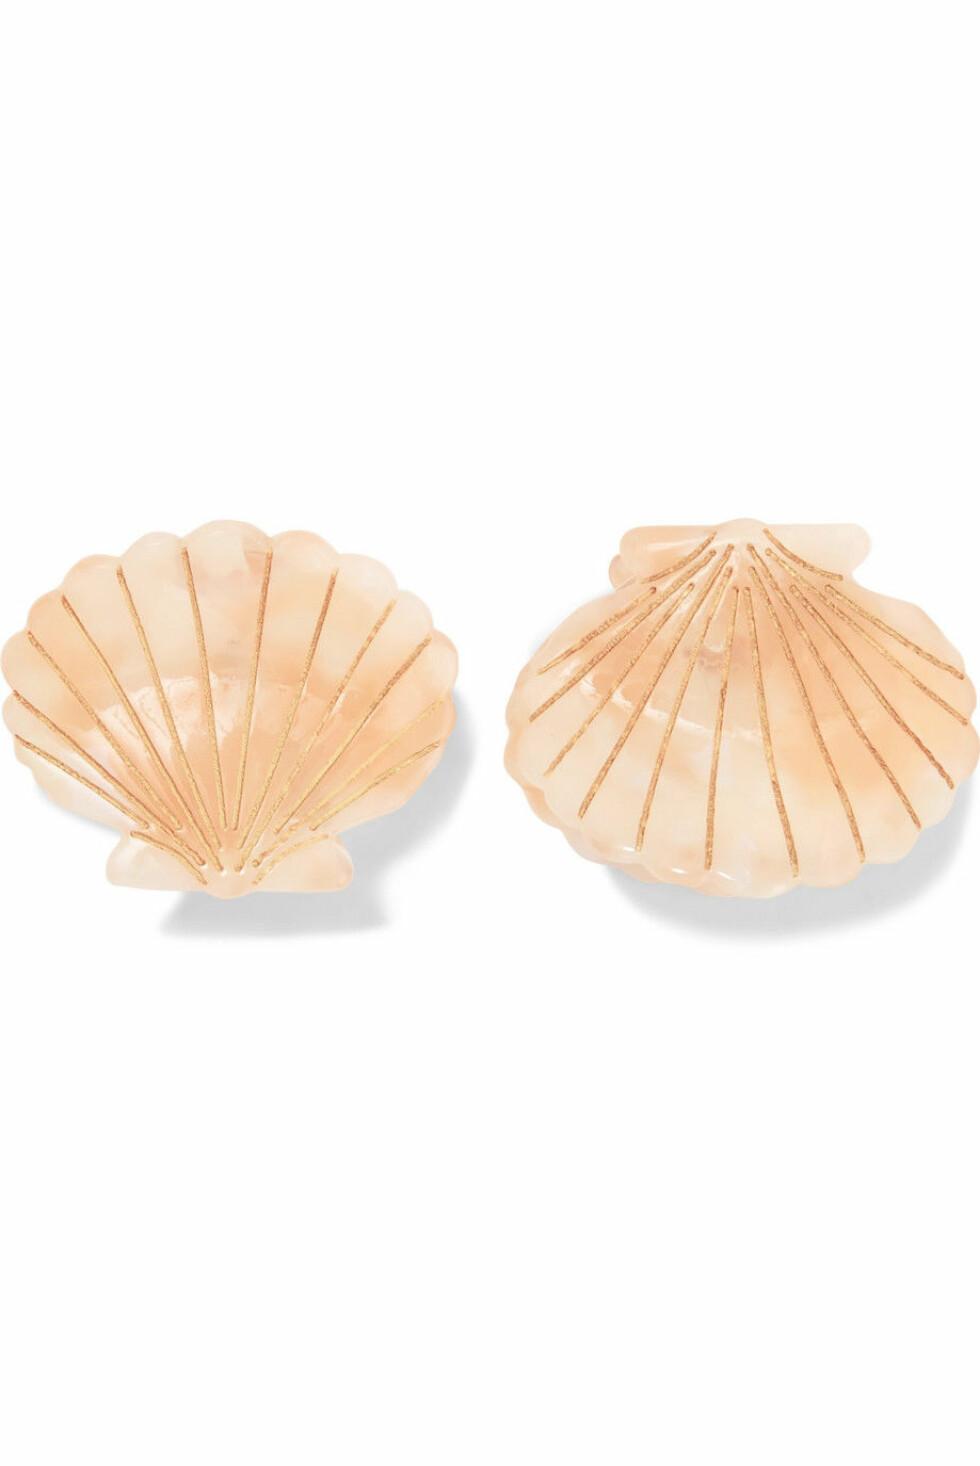 Valet |389,-| https://www.net-a-porter.com/no/en/product/1124910/valet/ursula-set-of-two-resin-hair-clips